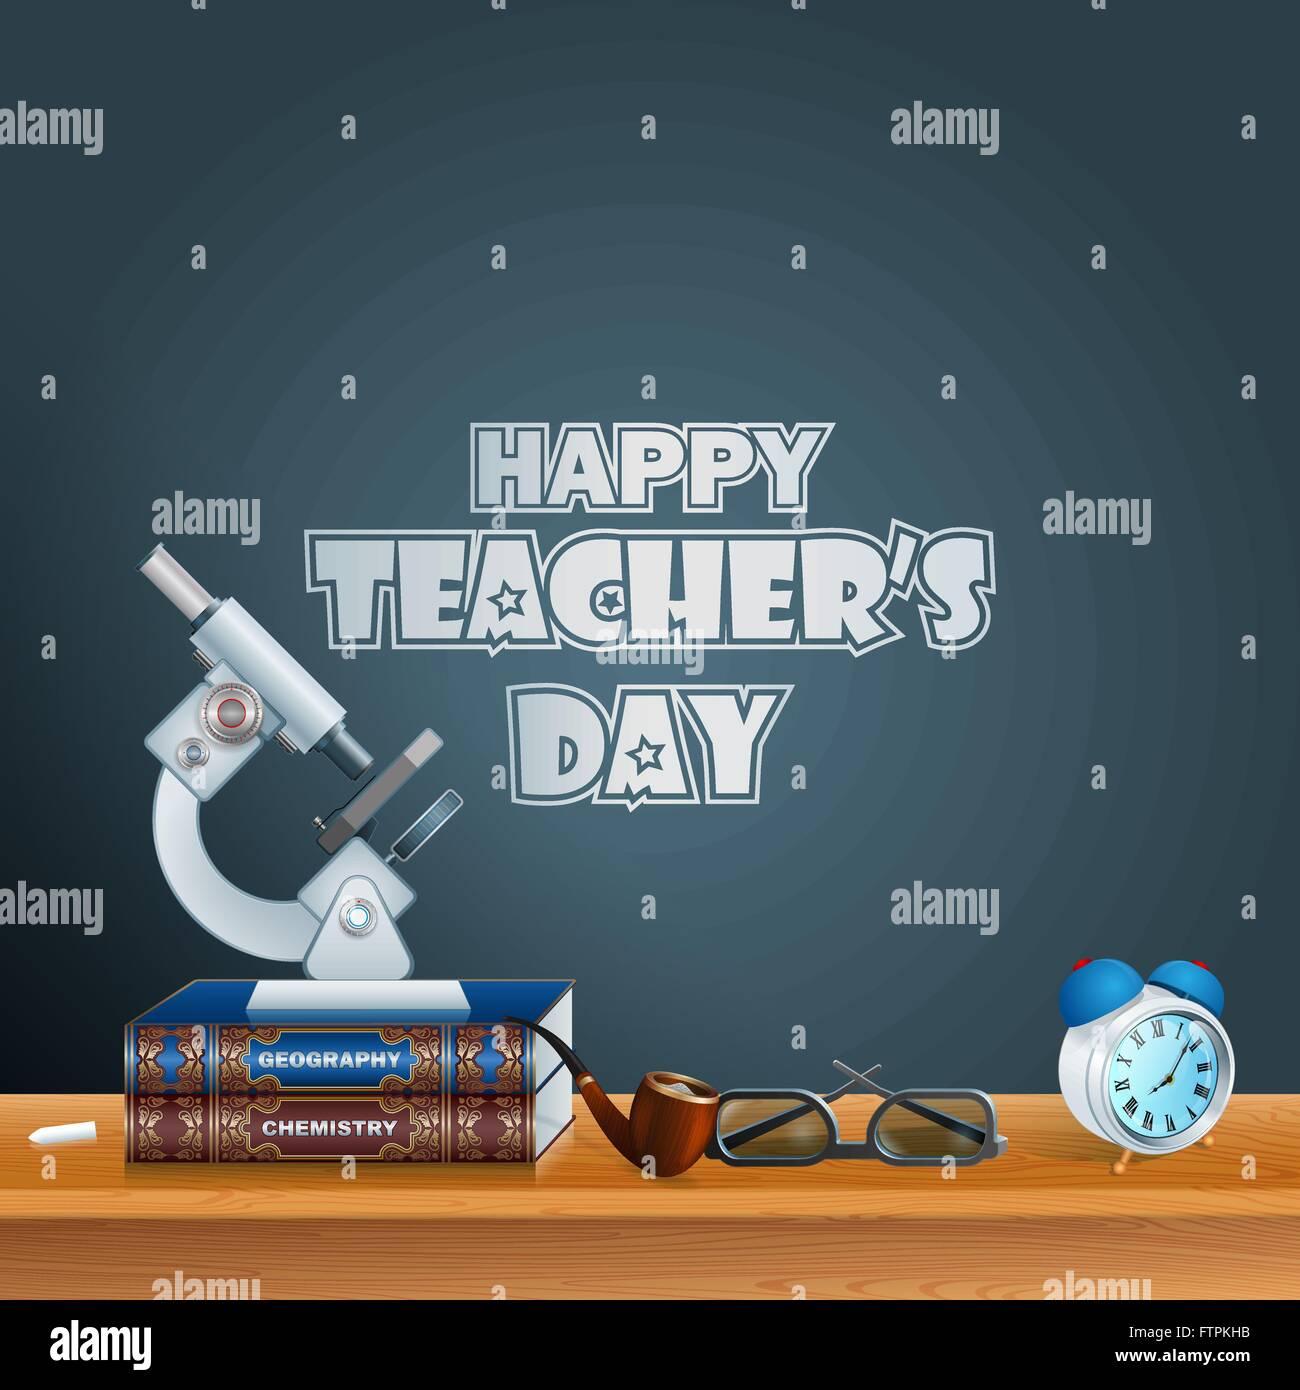 Happy Teacher S Day Template With School Books Microscope Eye